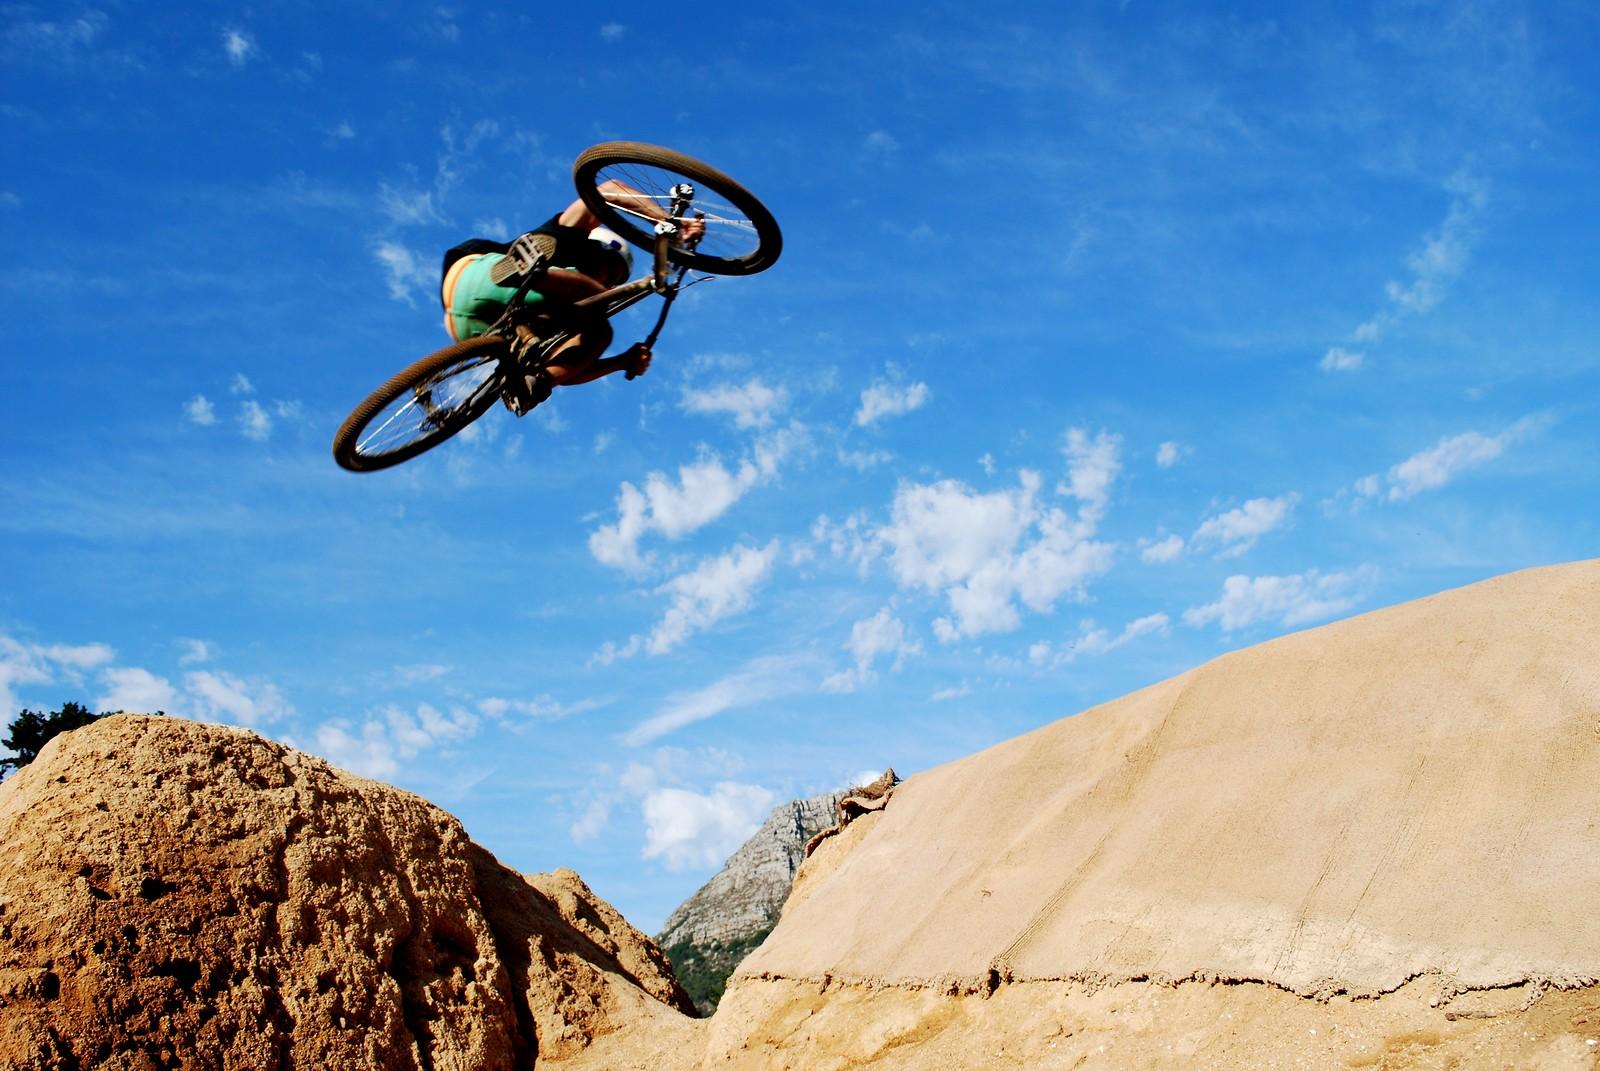 Downside - CandyMuffin - Mountain Biking Pictures - Vital MTB